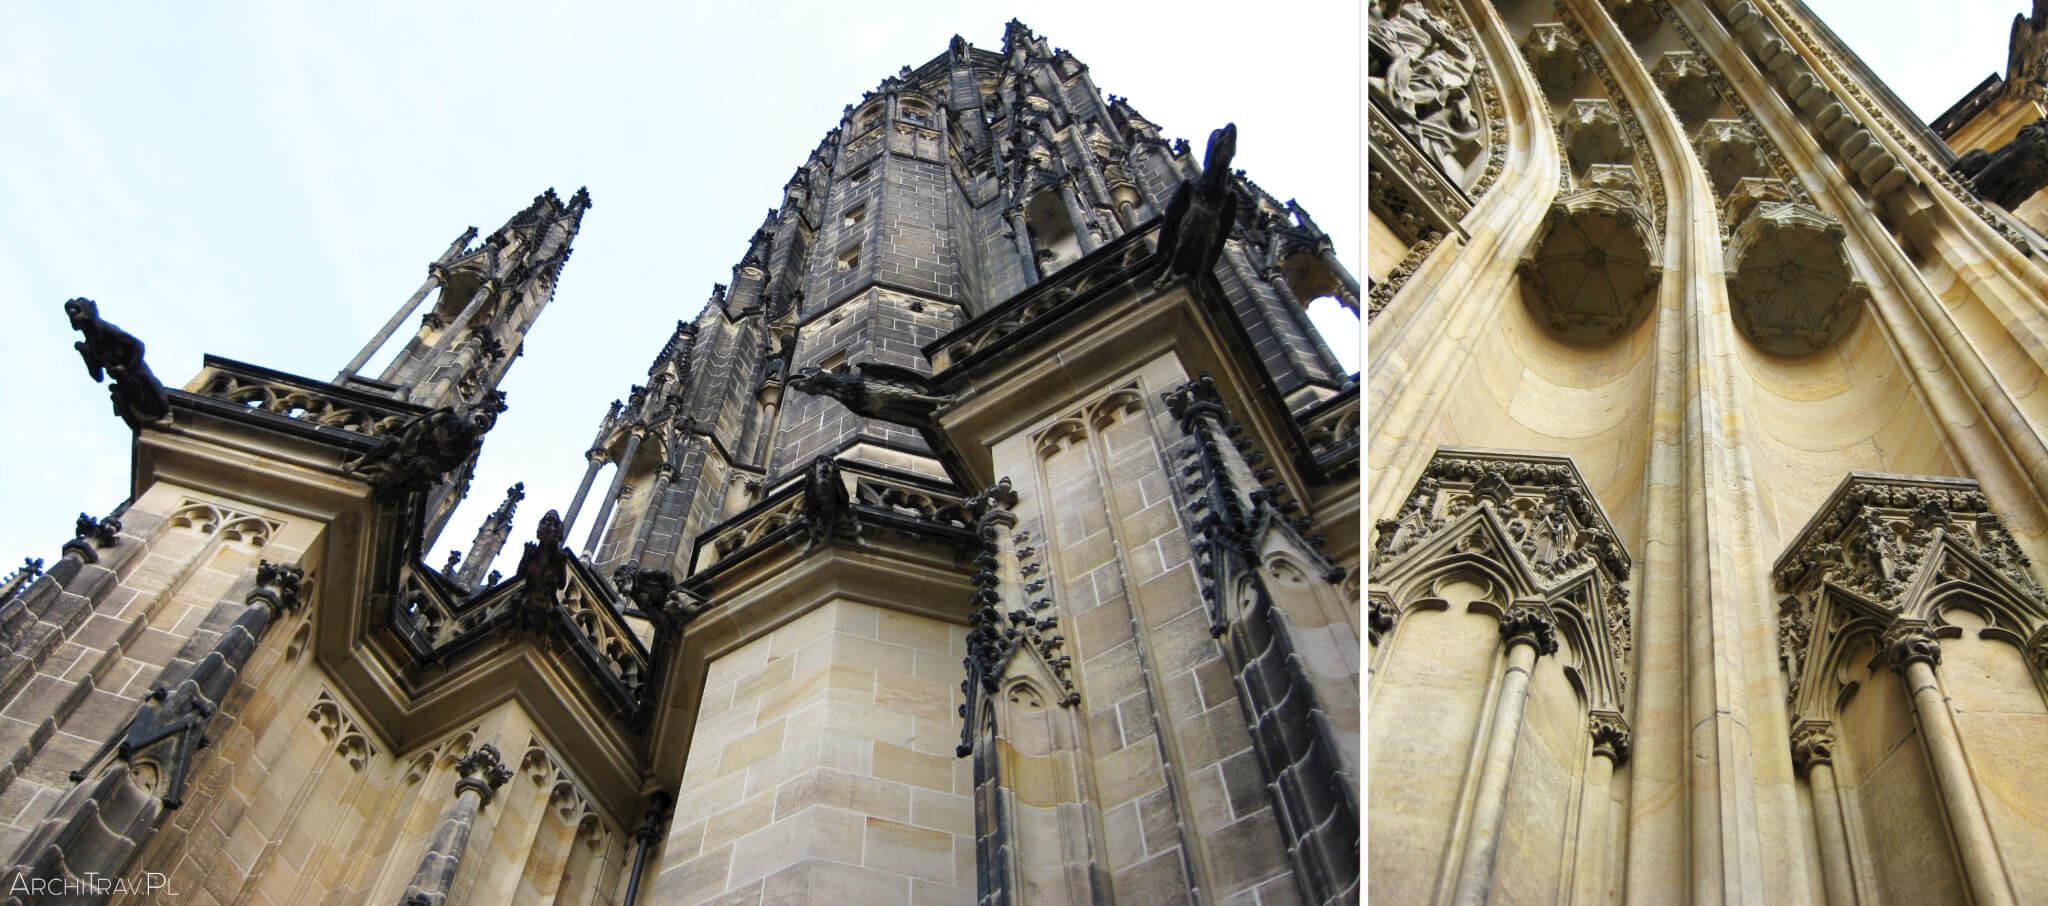 katedra sw wita detale